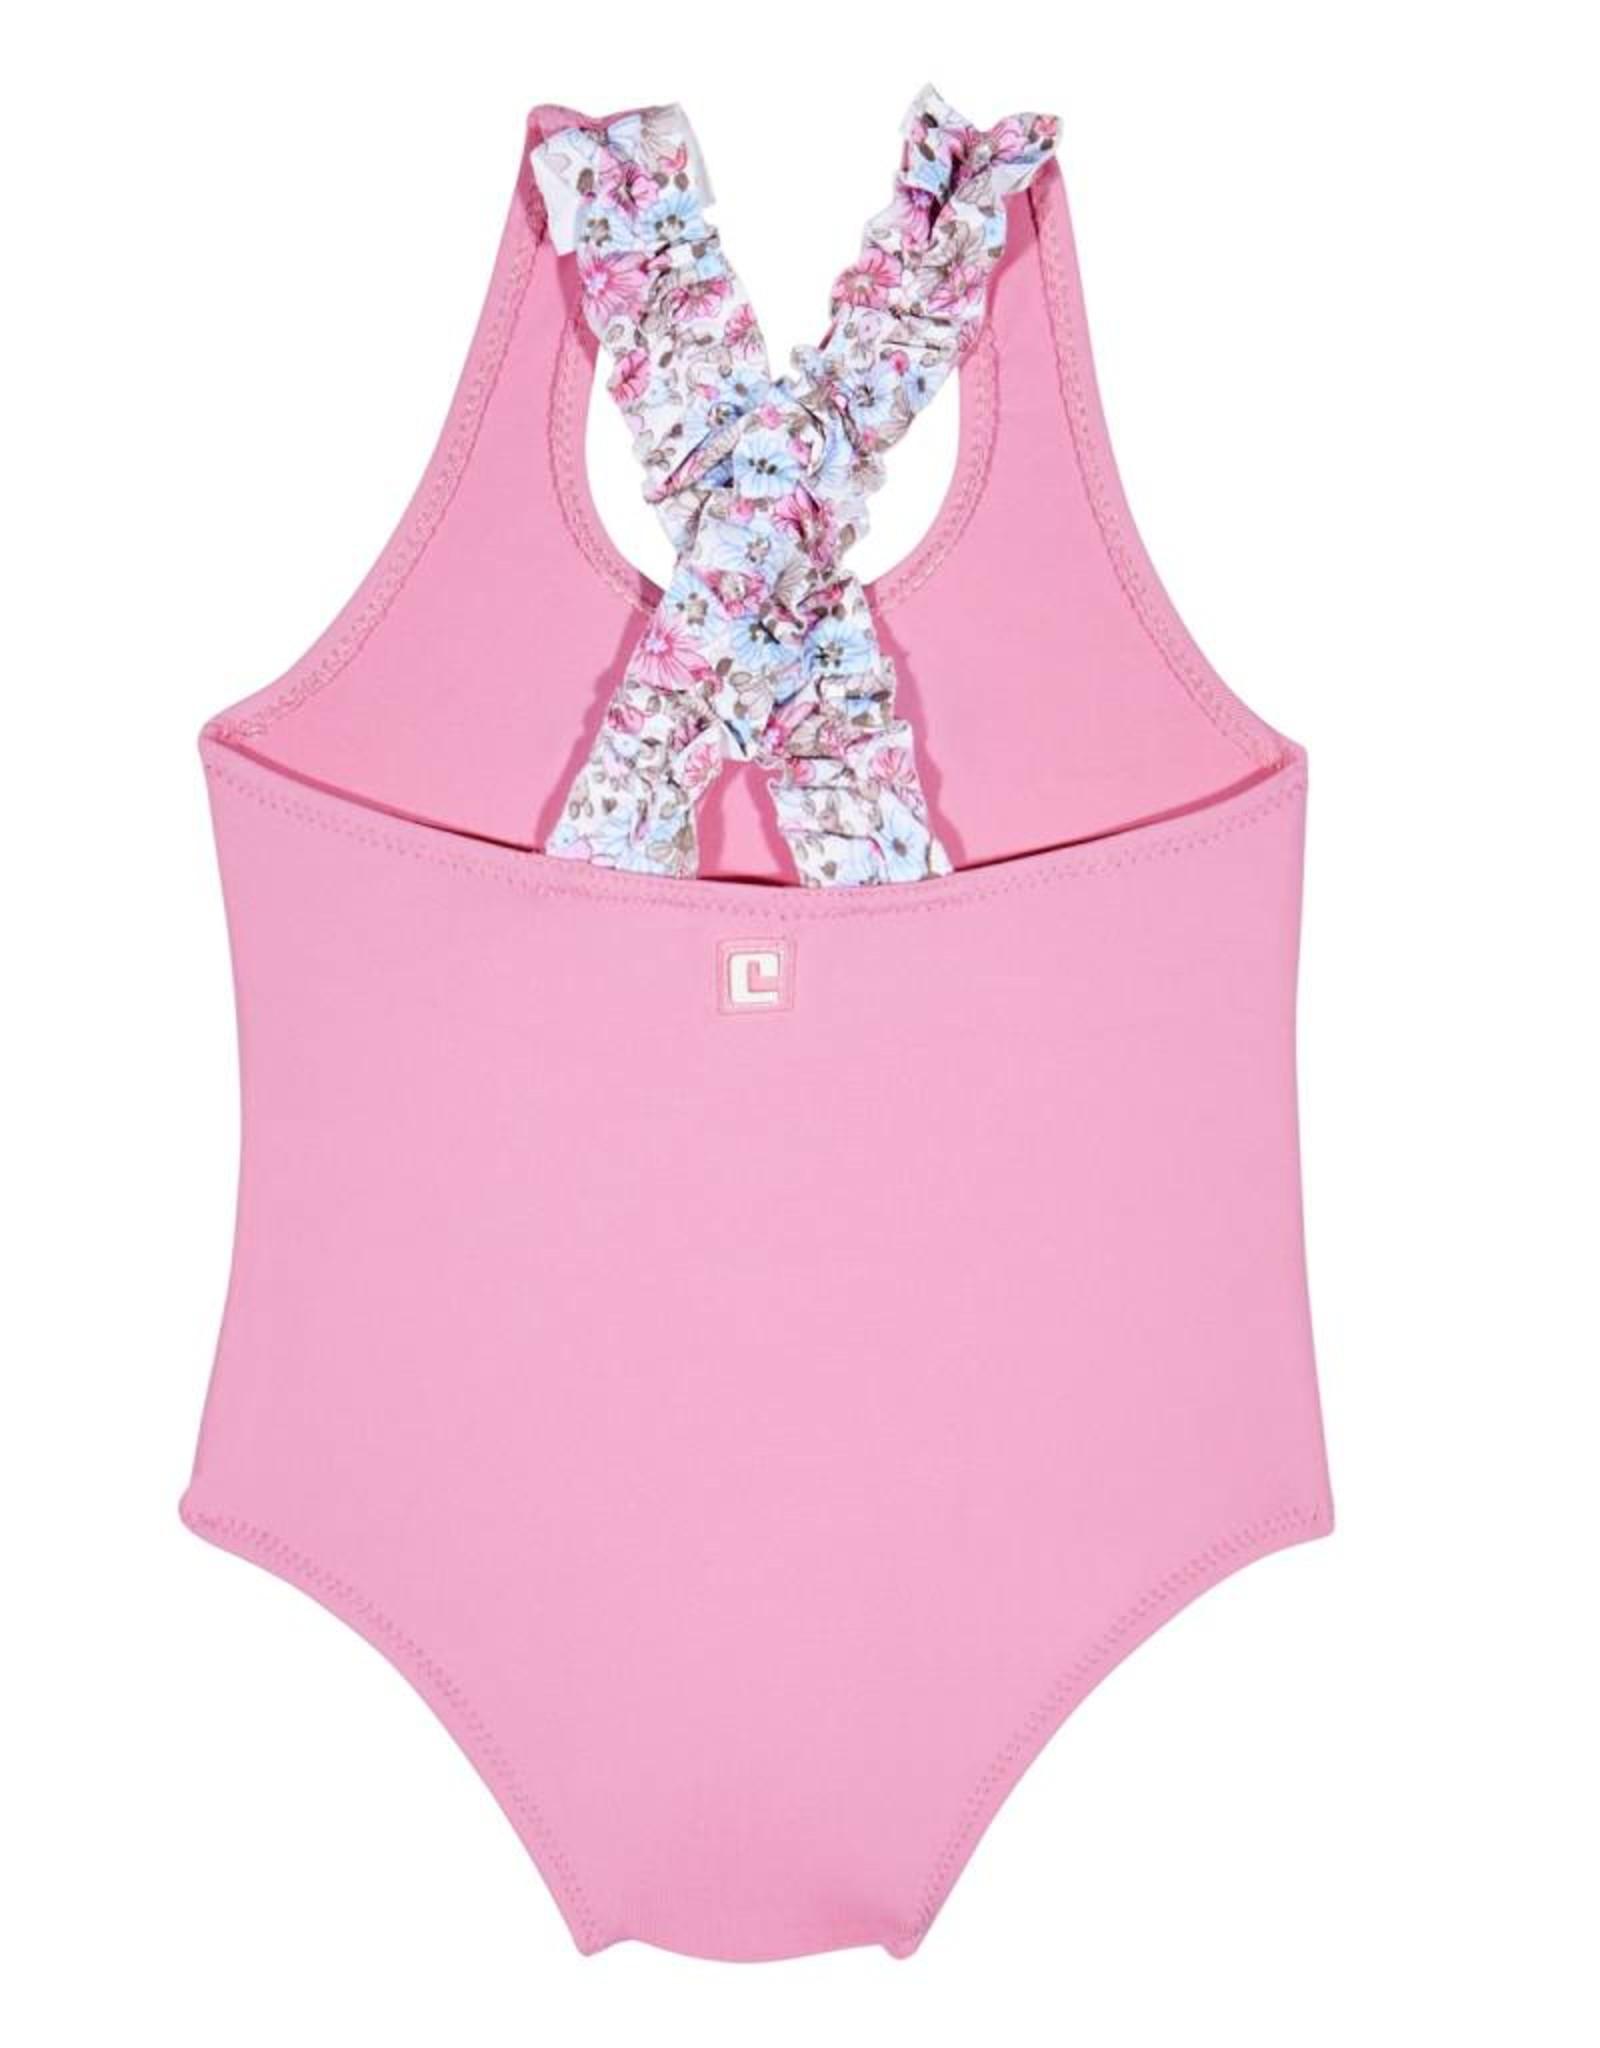 Condor Swimsuit, flower bow